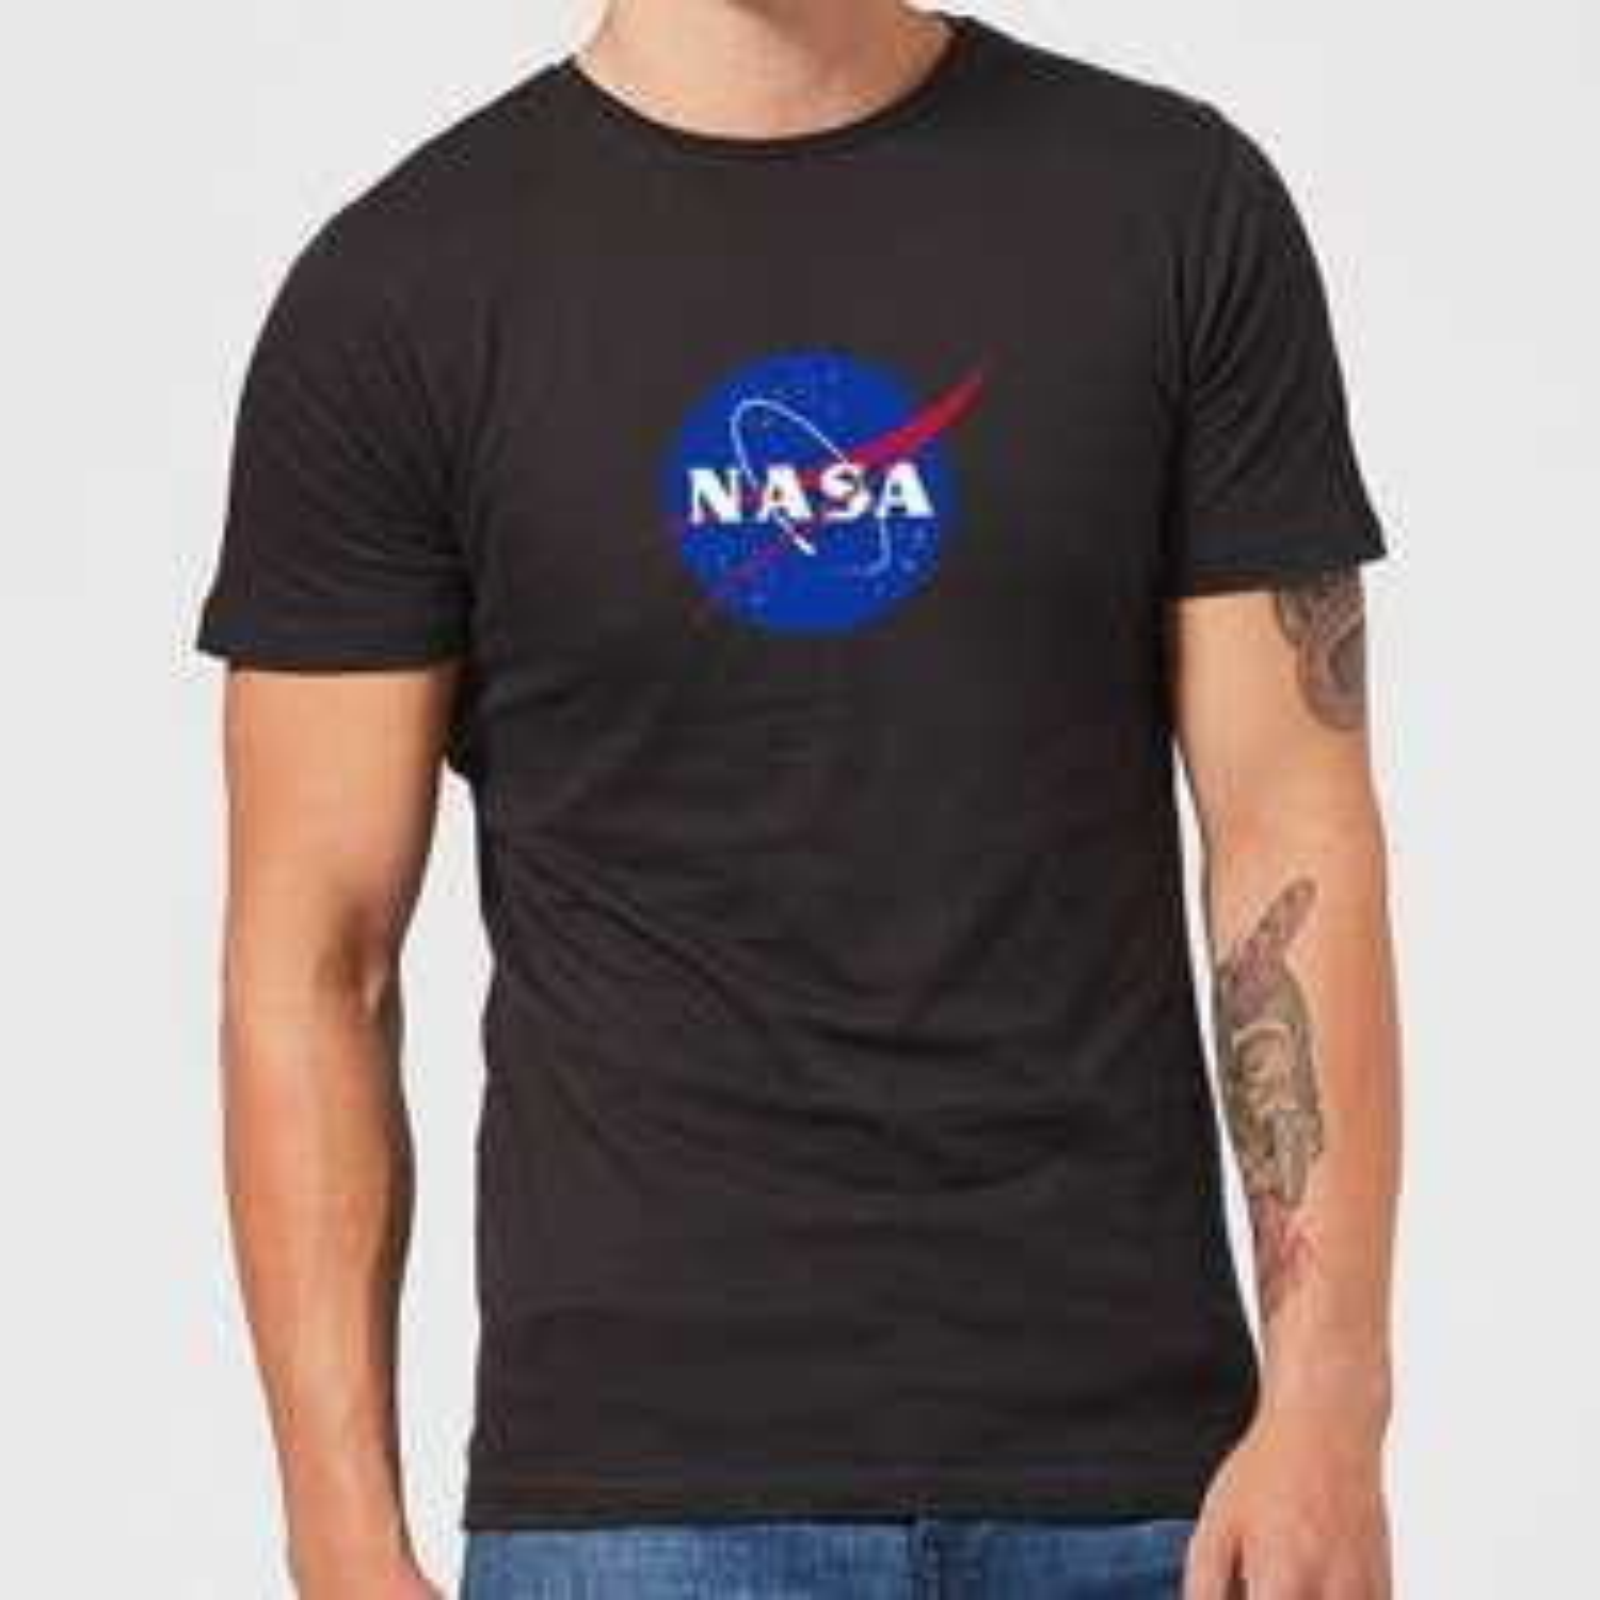 NASA T-Shirts £8.99 delivered with code at IWOOT